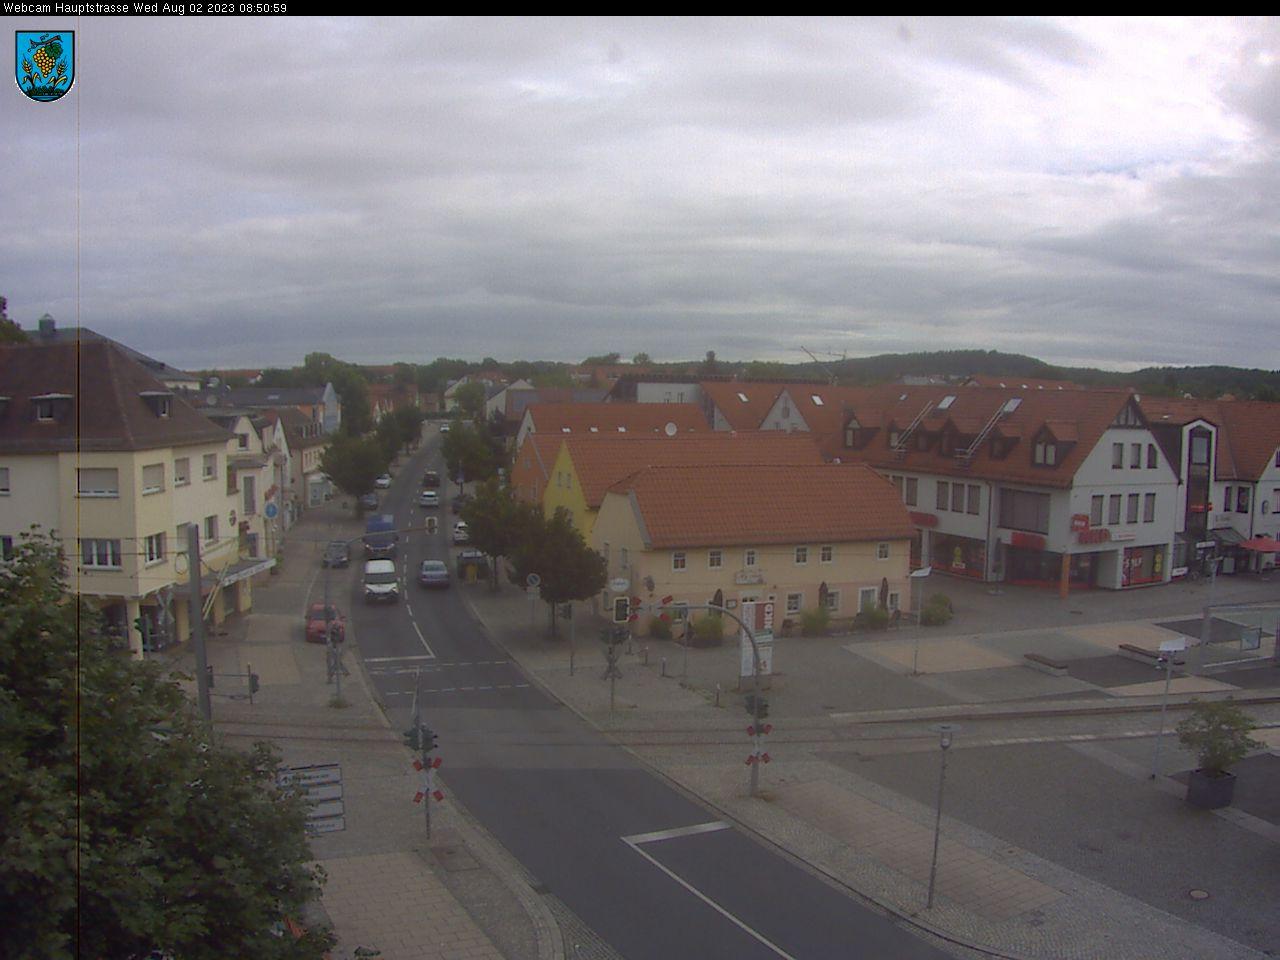 Coswig (Sassonia) Mer. 08:51